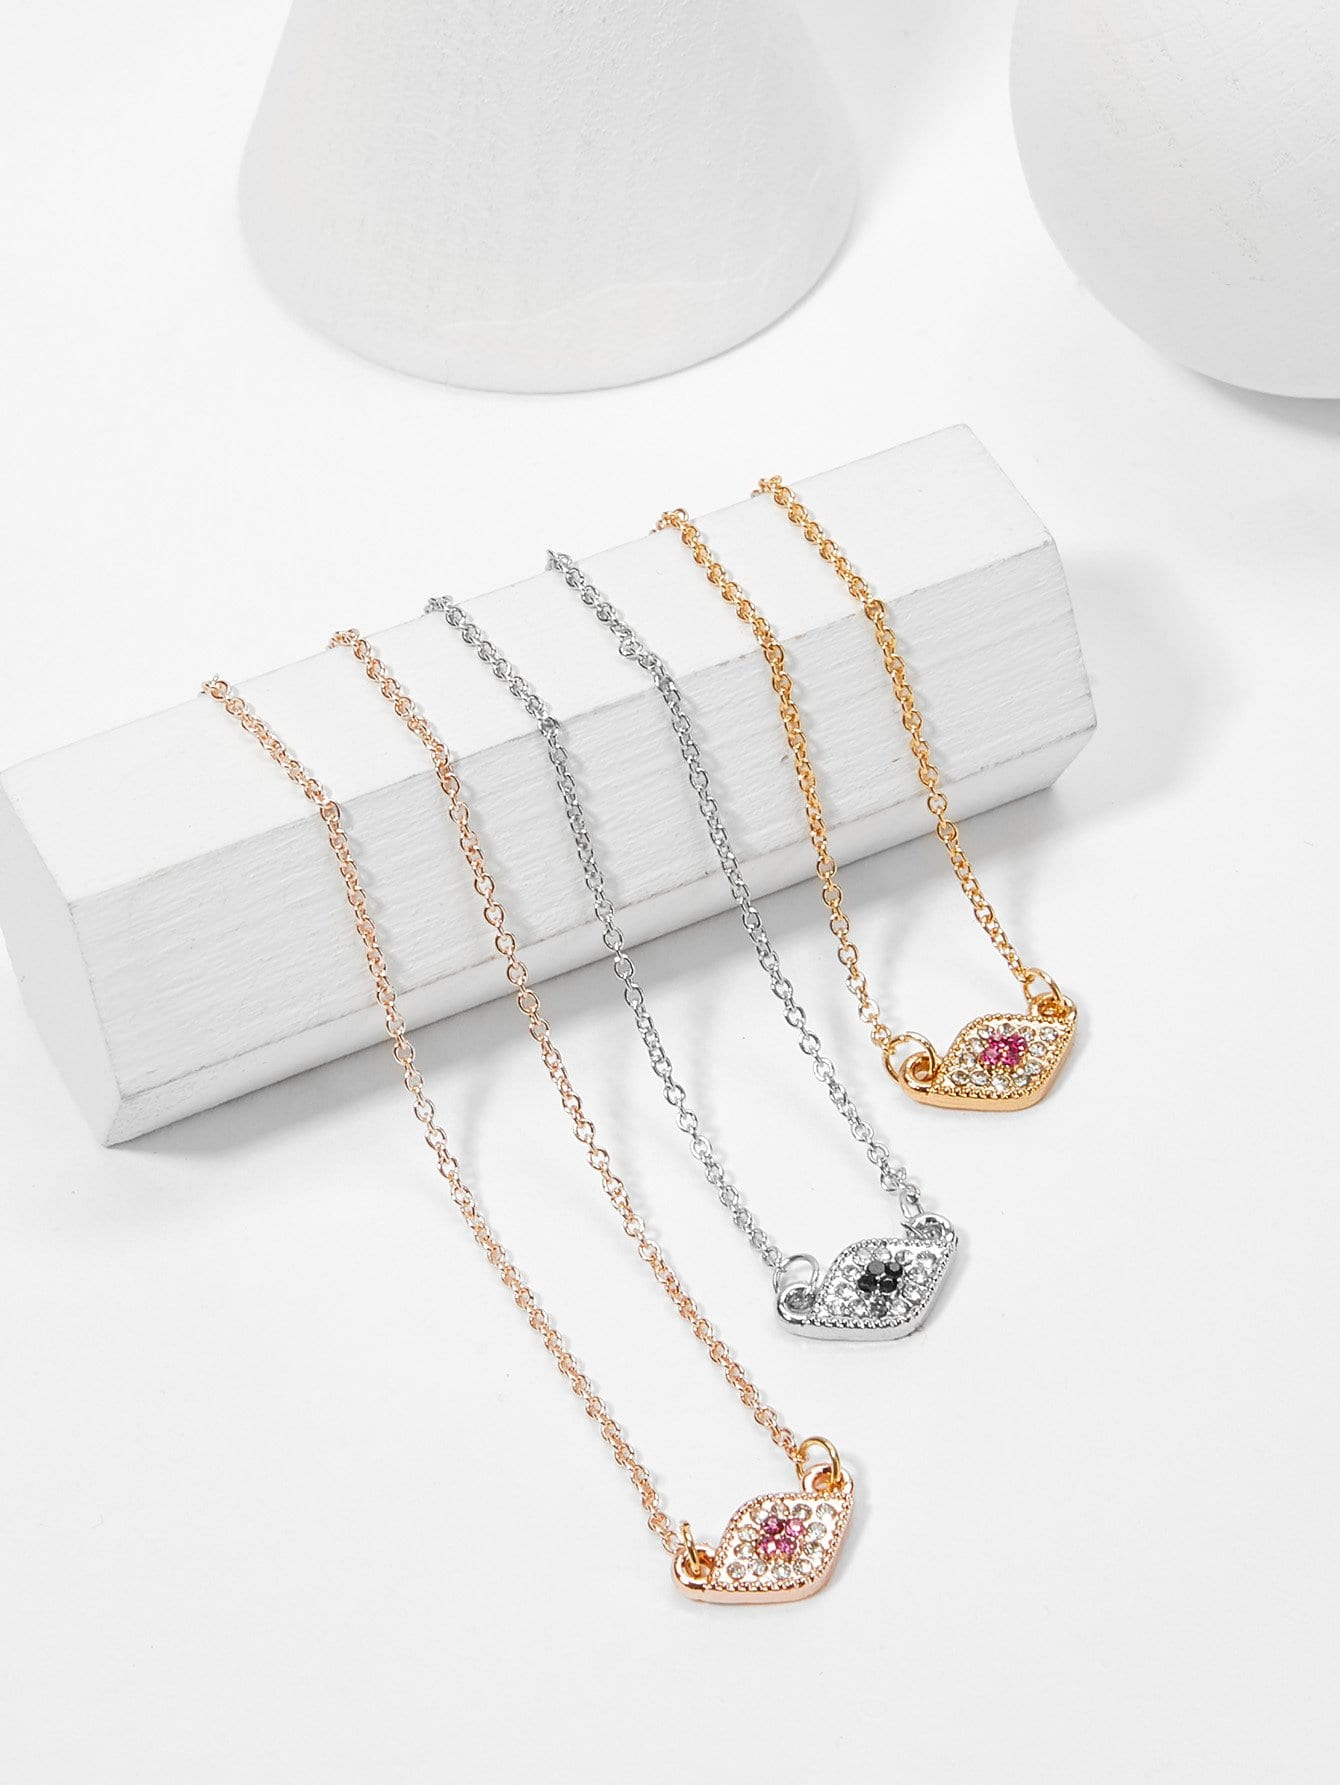 Rhinestone Pendant Necklace Set 3pcs hollow heart pendant necklace set 3pcs